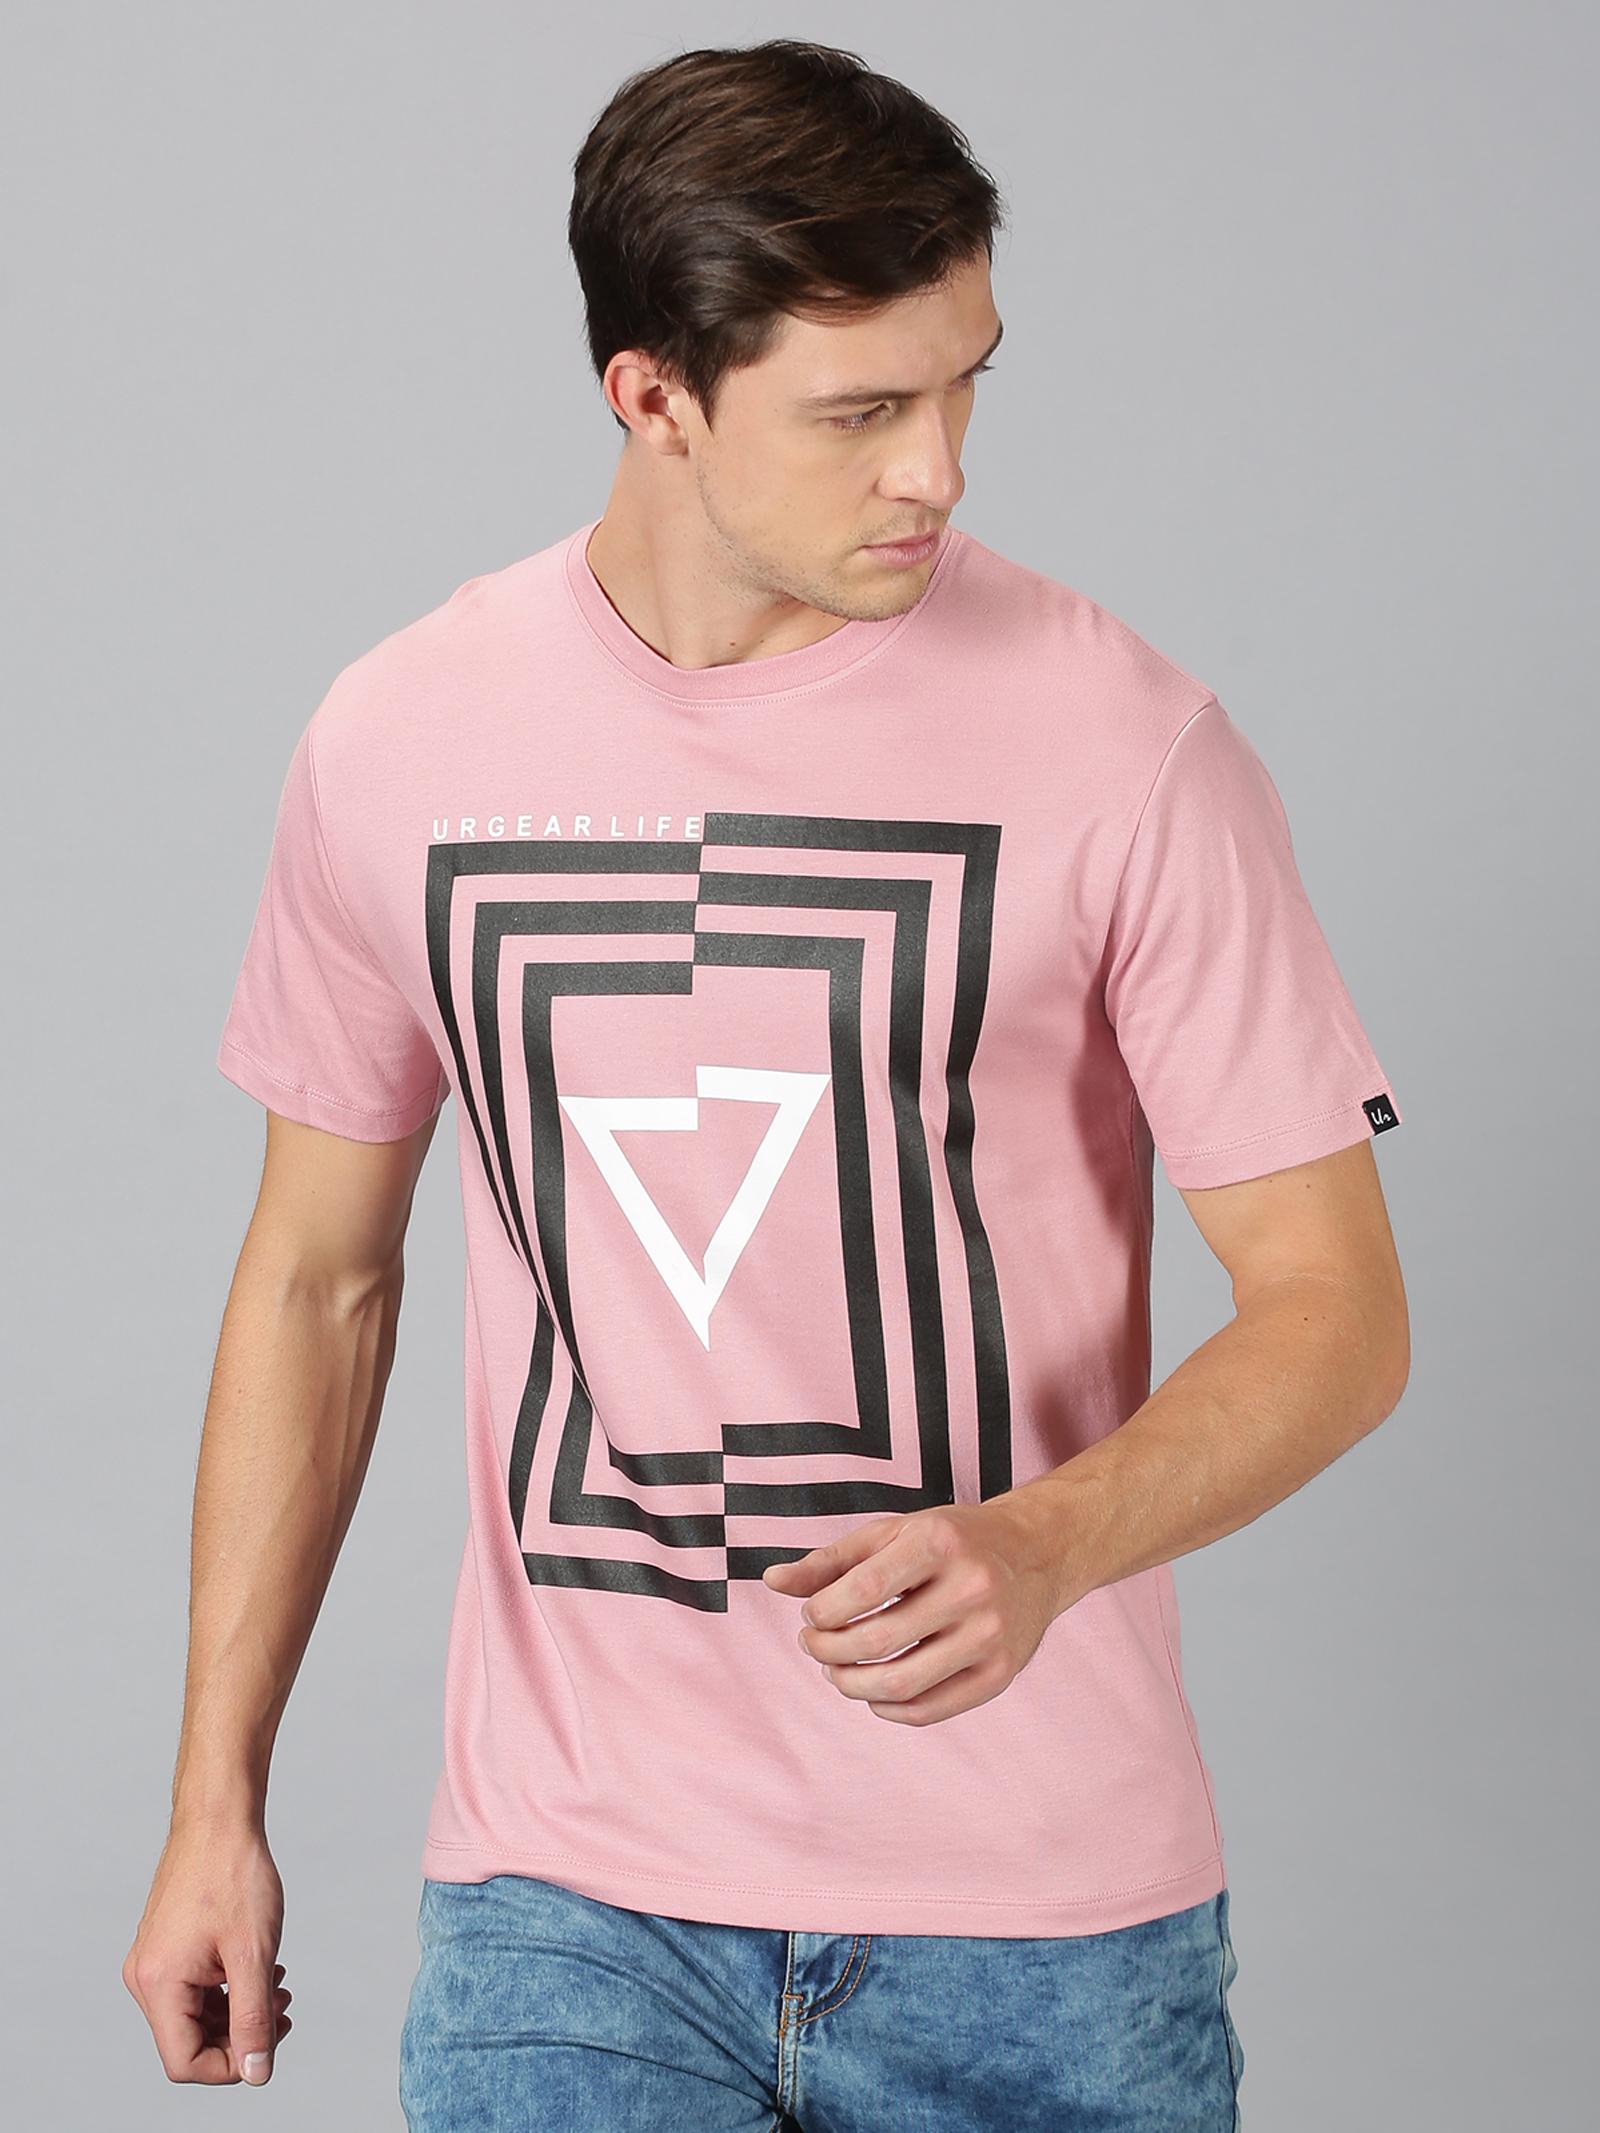 UrGear | UrGear Printed Round Neck Pink T-Shirt